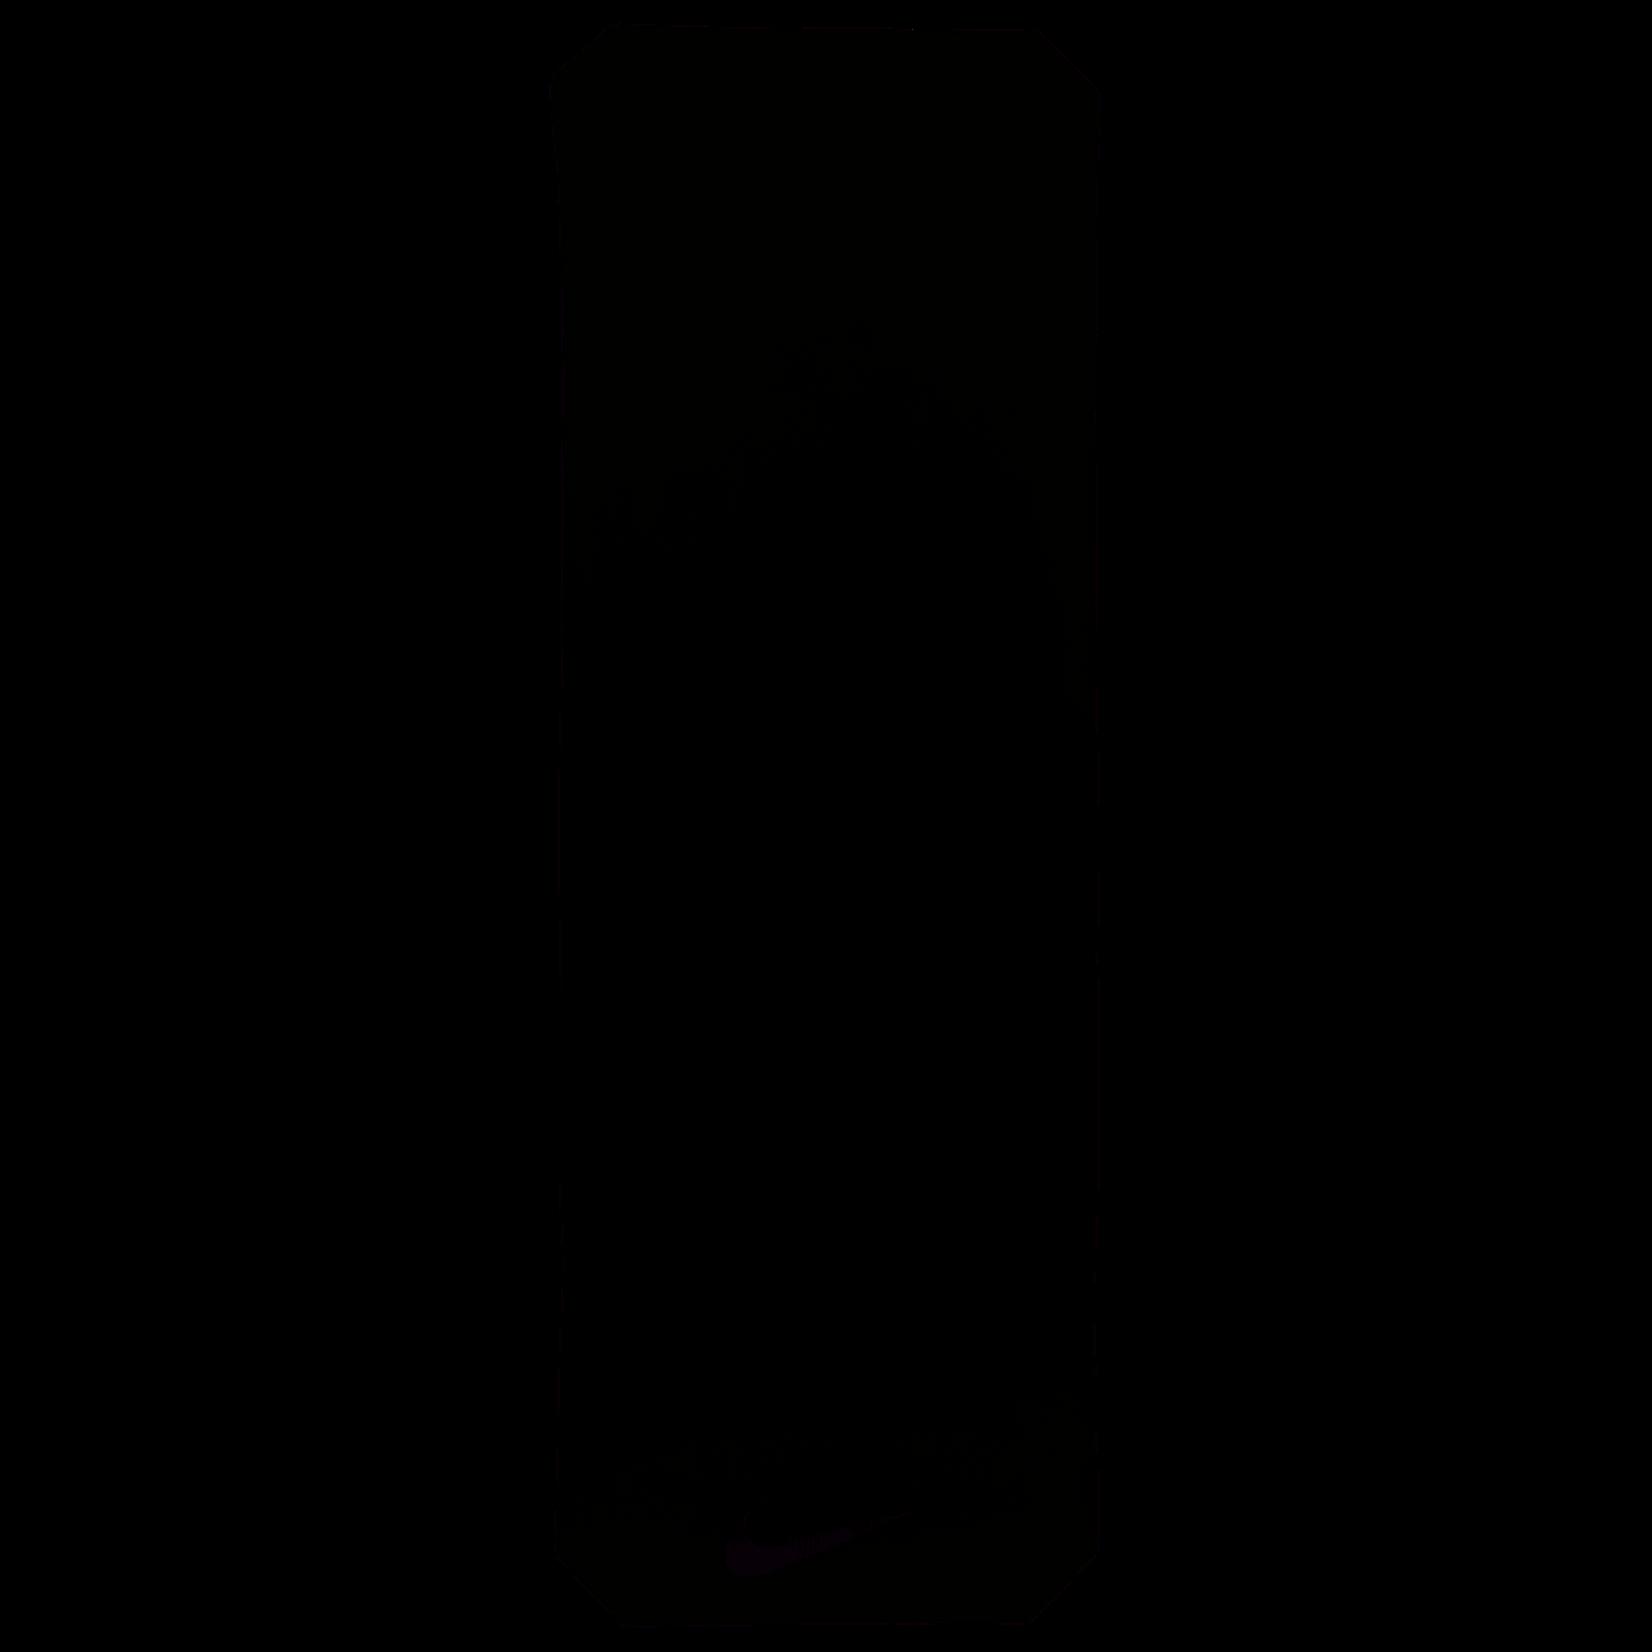 Nike Training / Yoga Mat